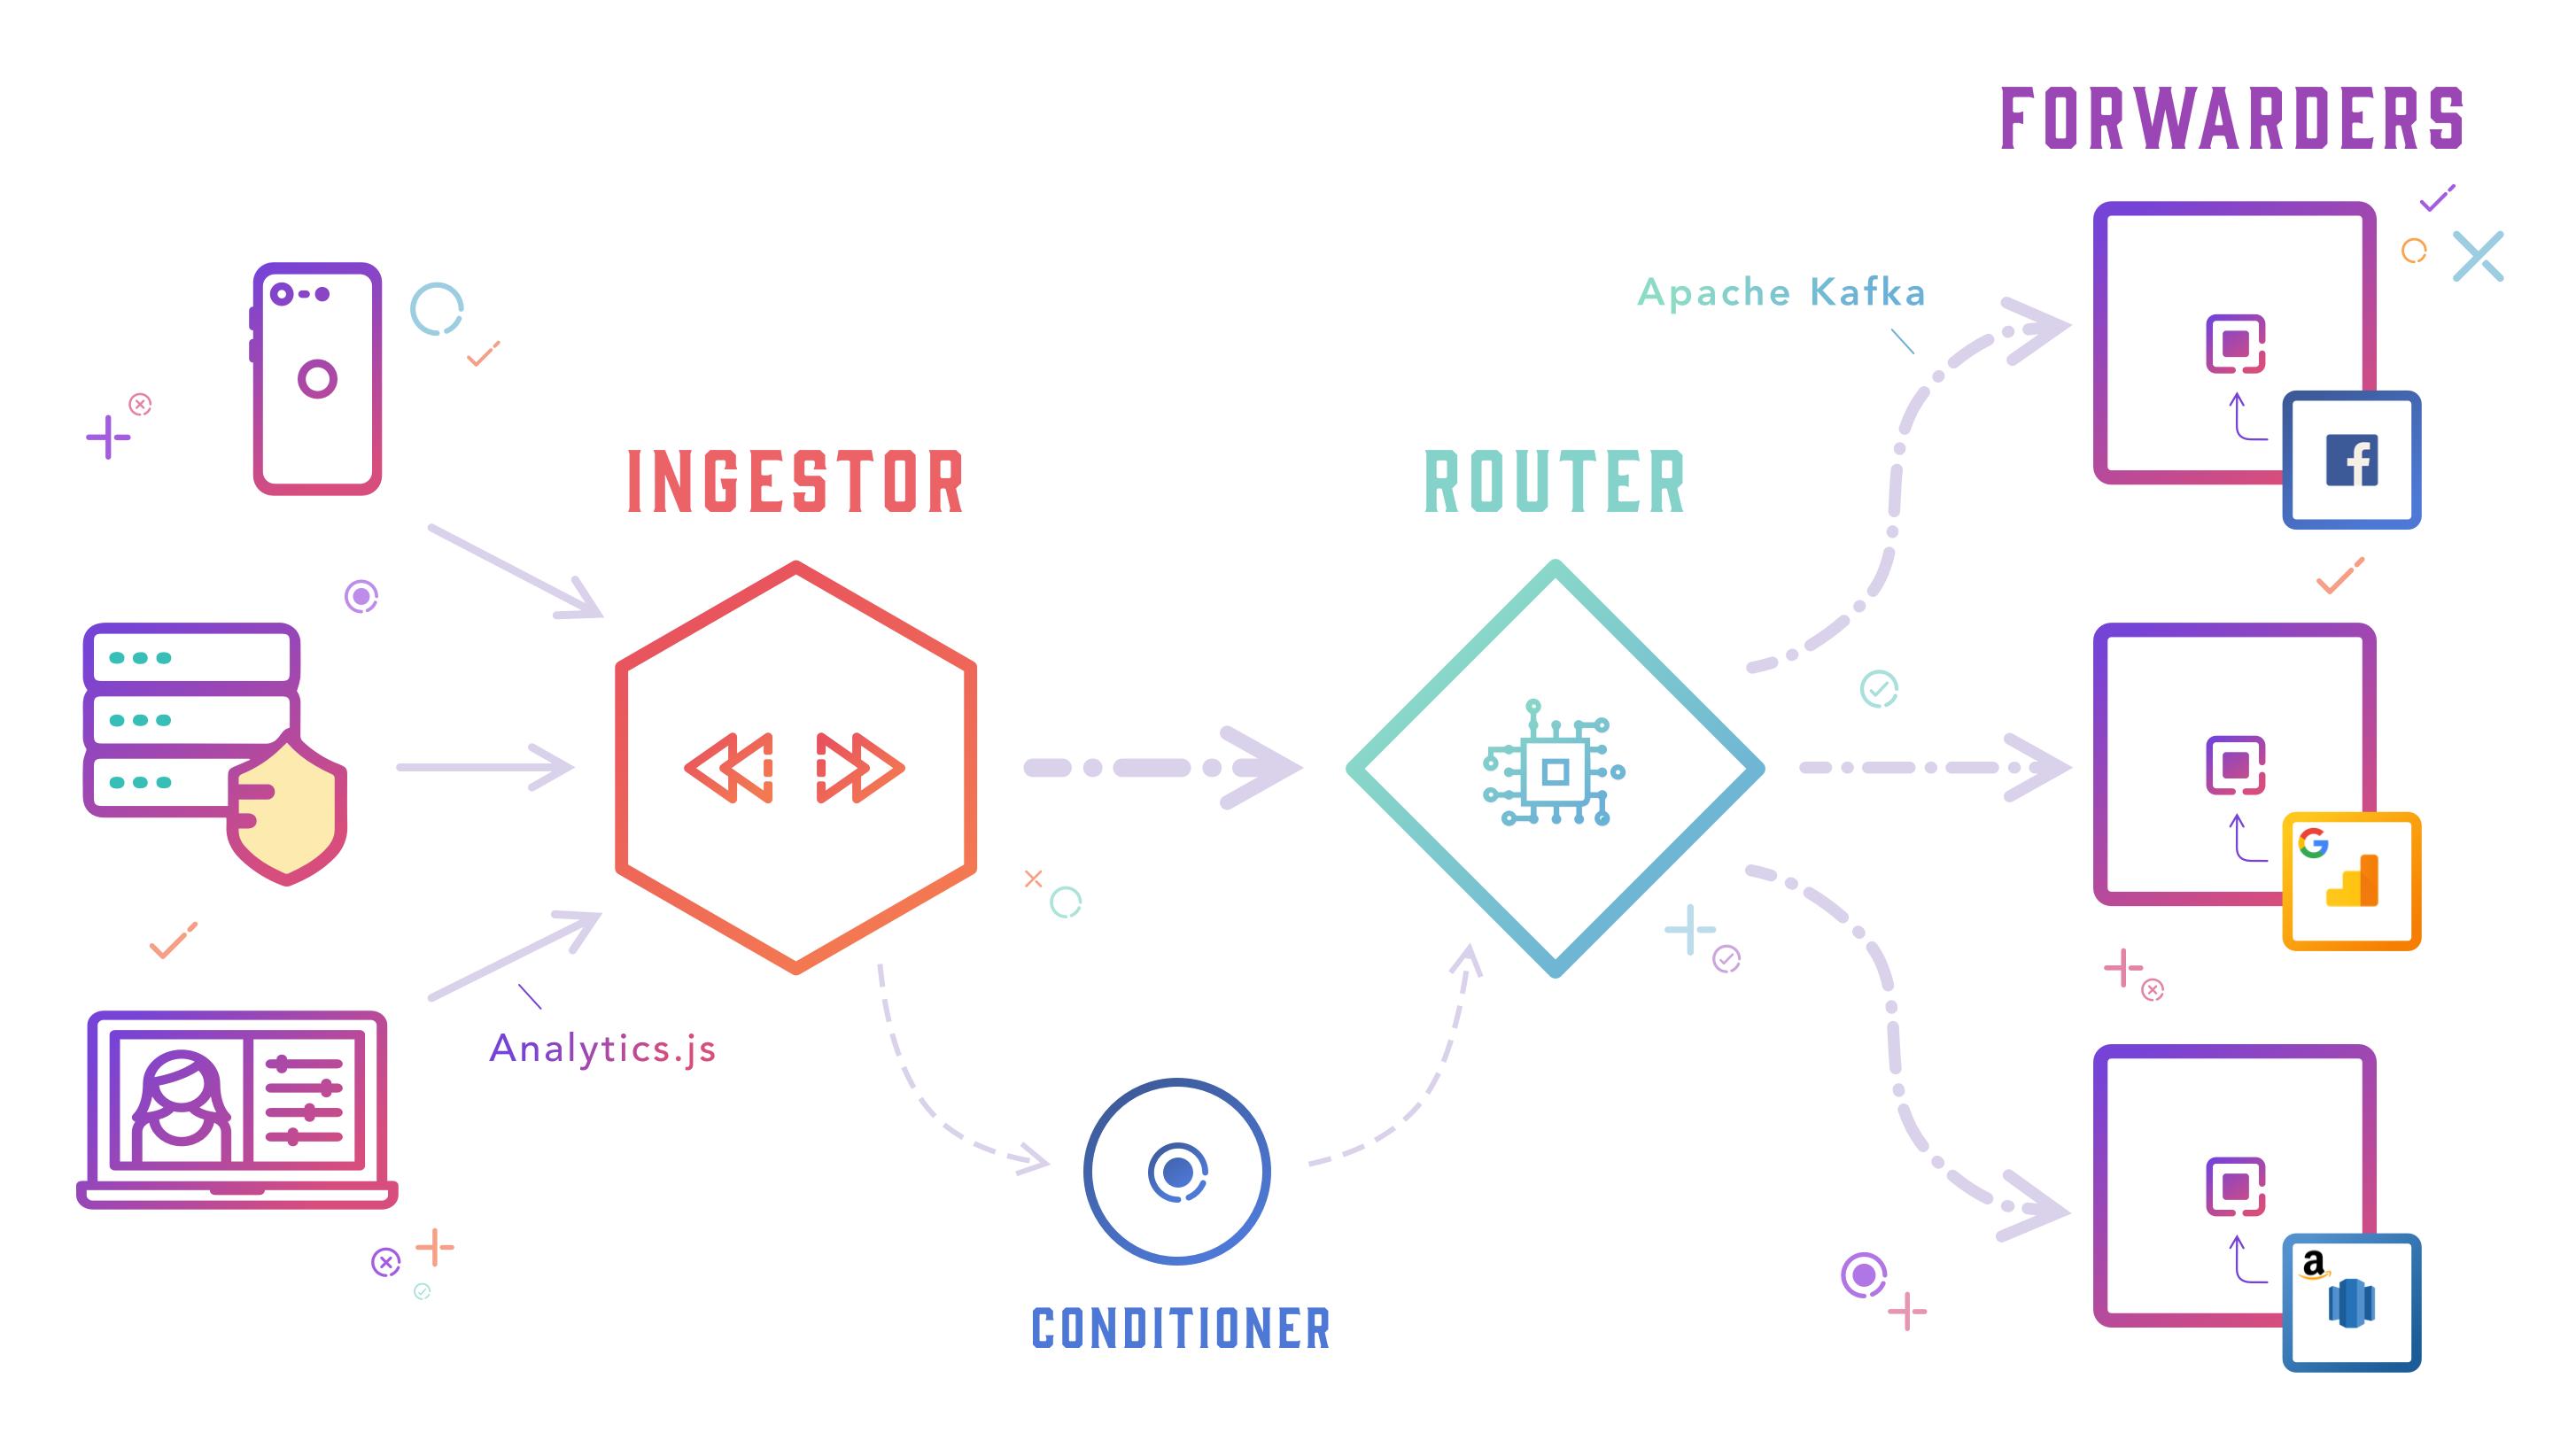 MetaRouter Overview